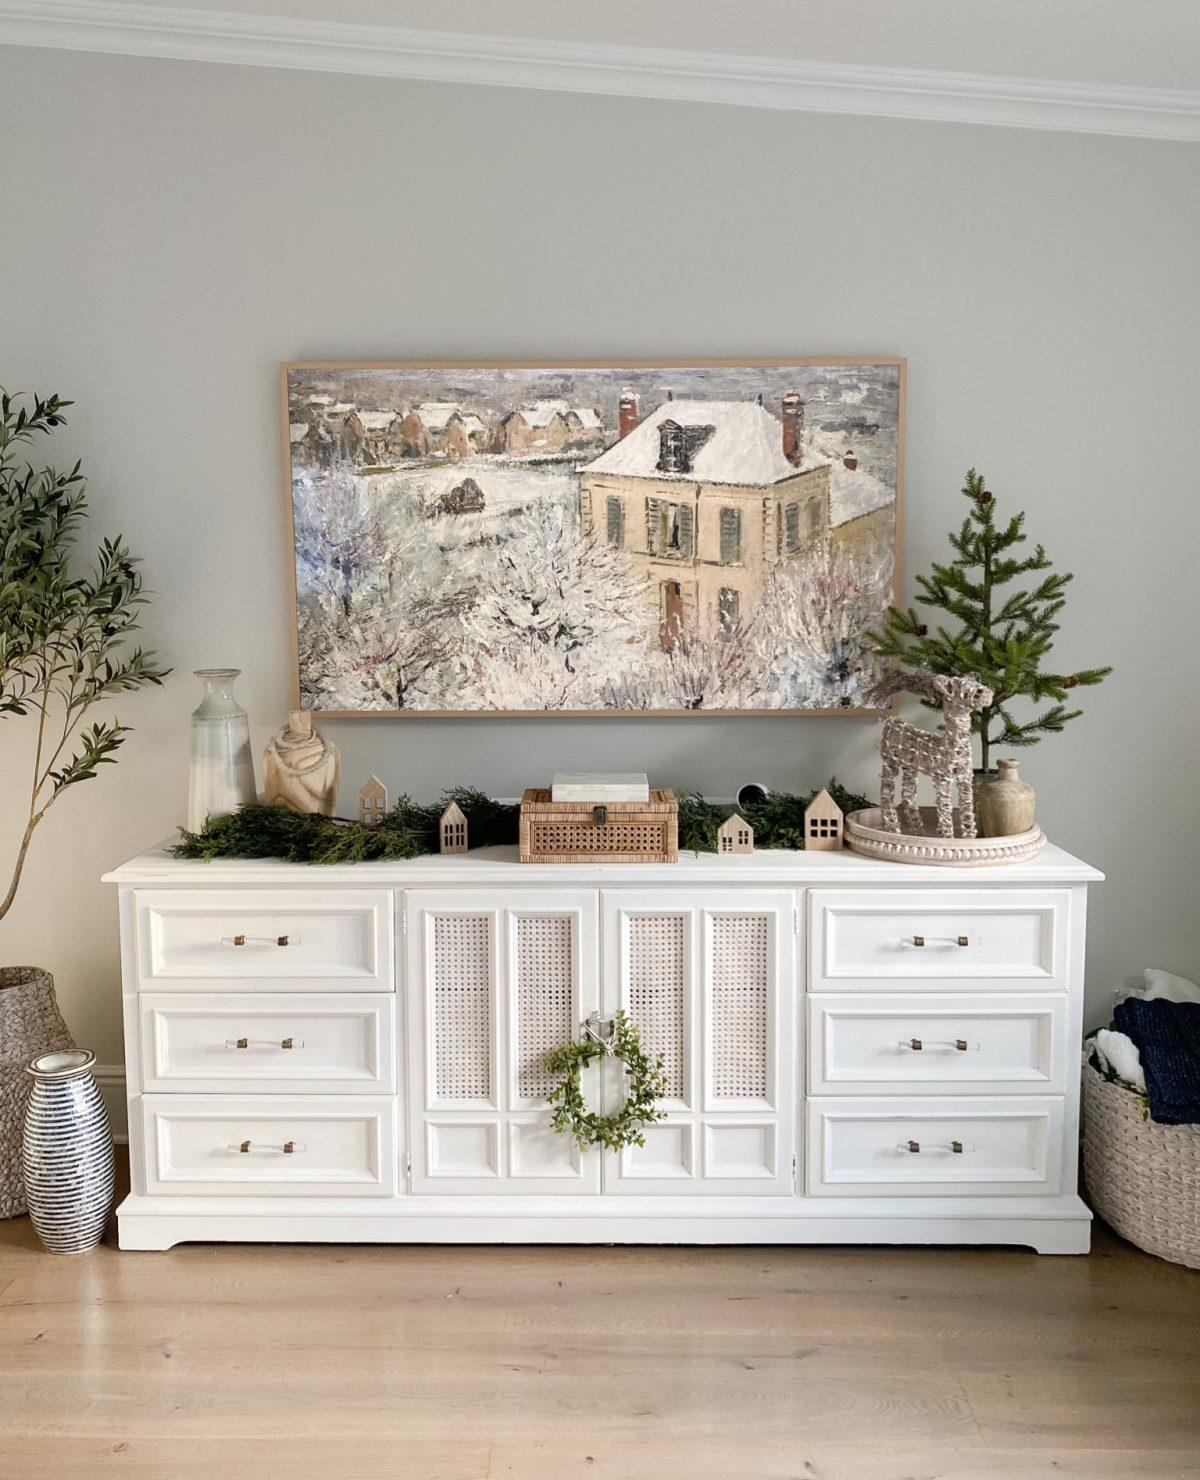 winter digital art displayed in a living room